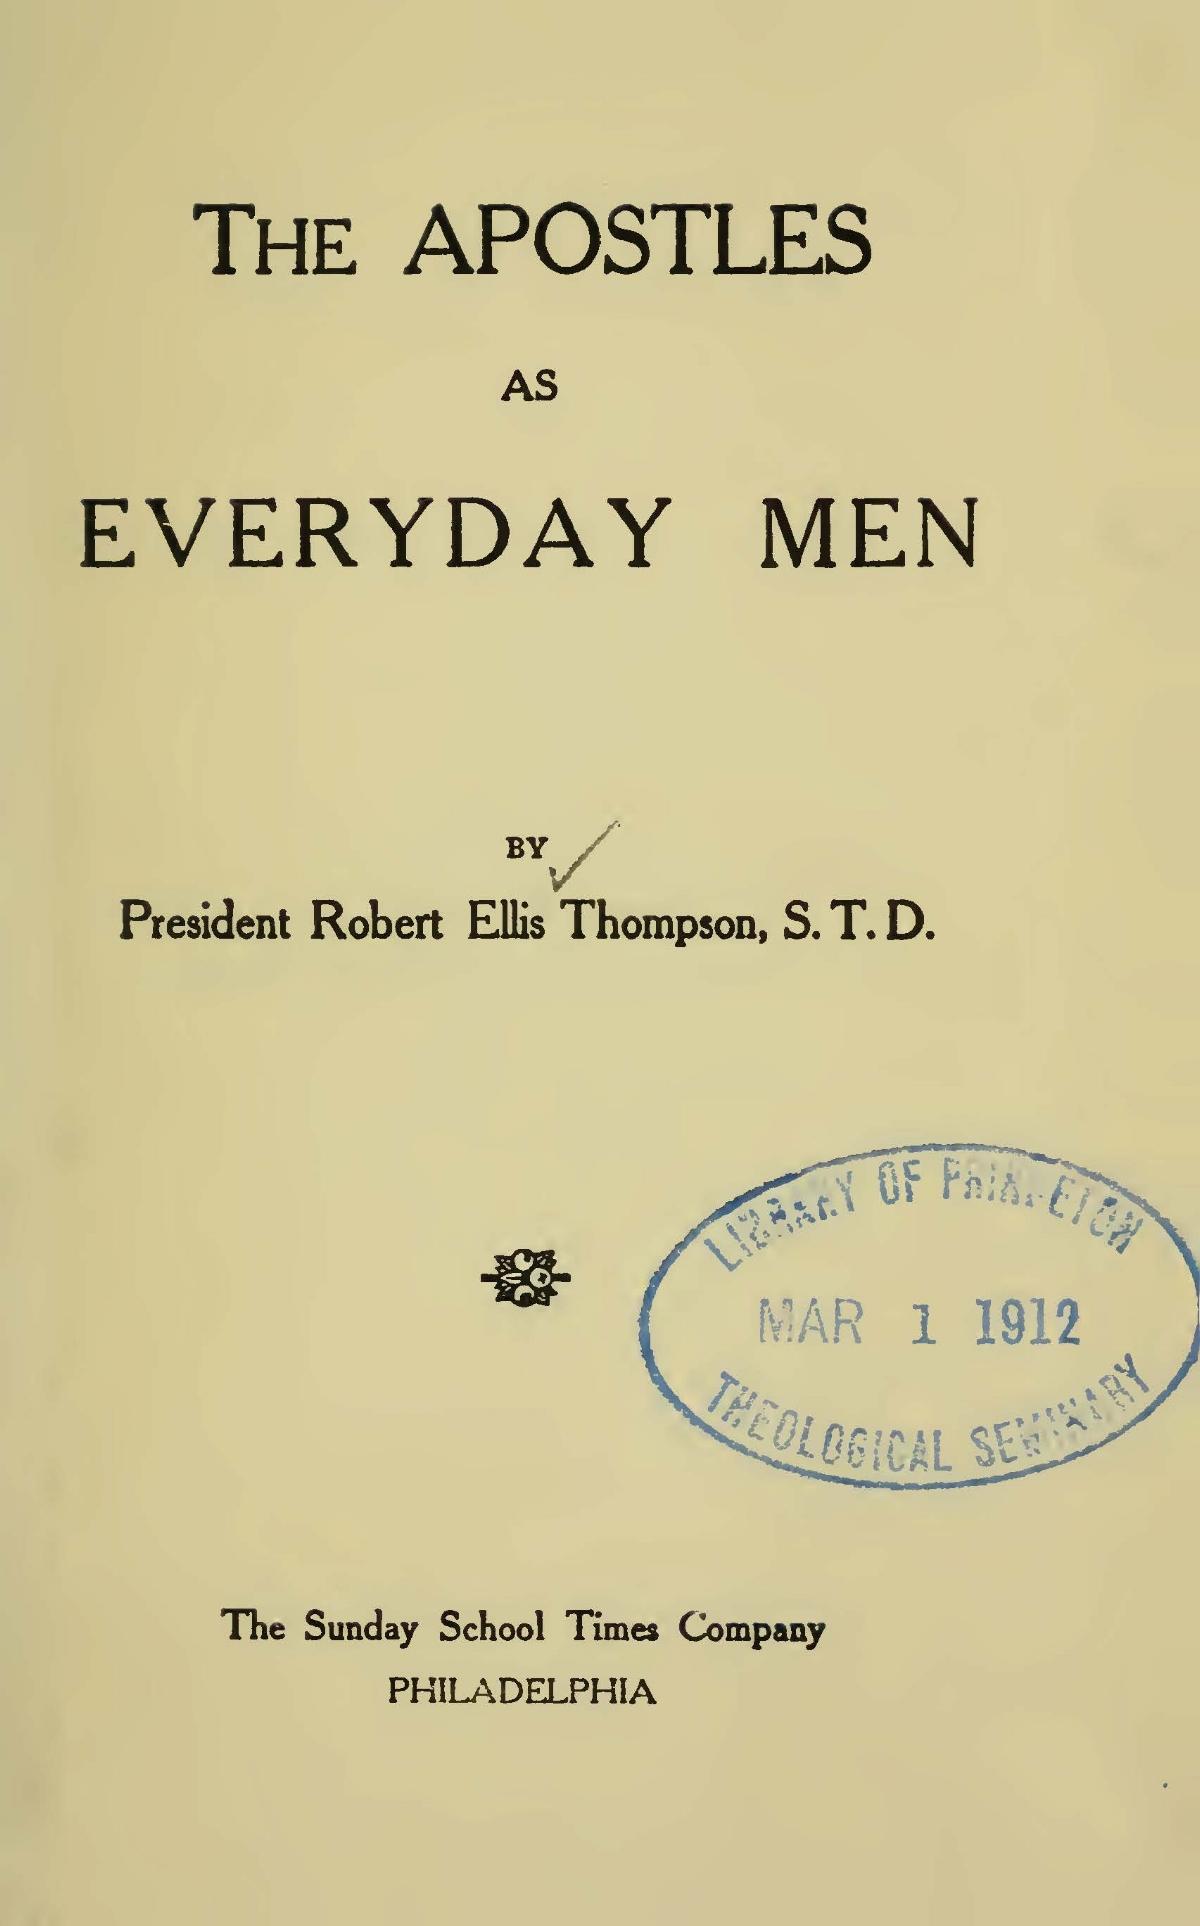 Thompson, Robert Ellis, The Apostles as Everyday Men Title Page.jpg